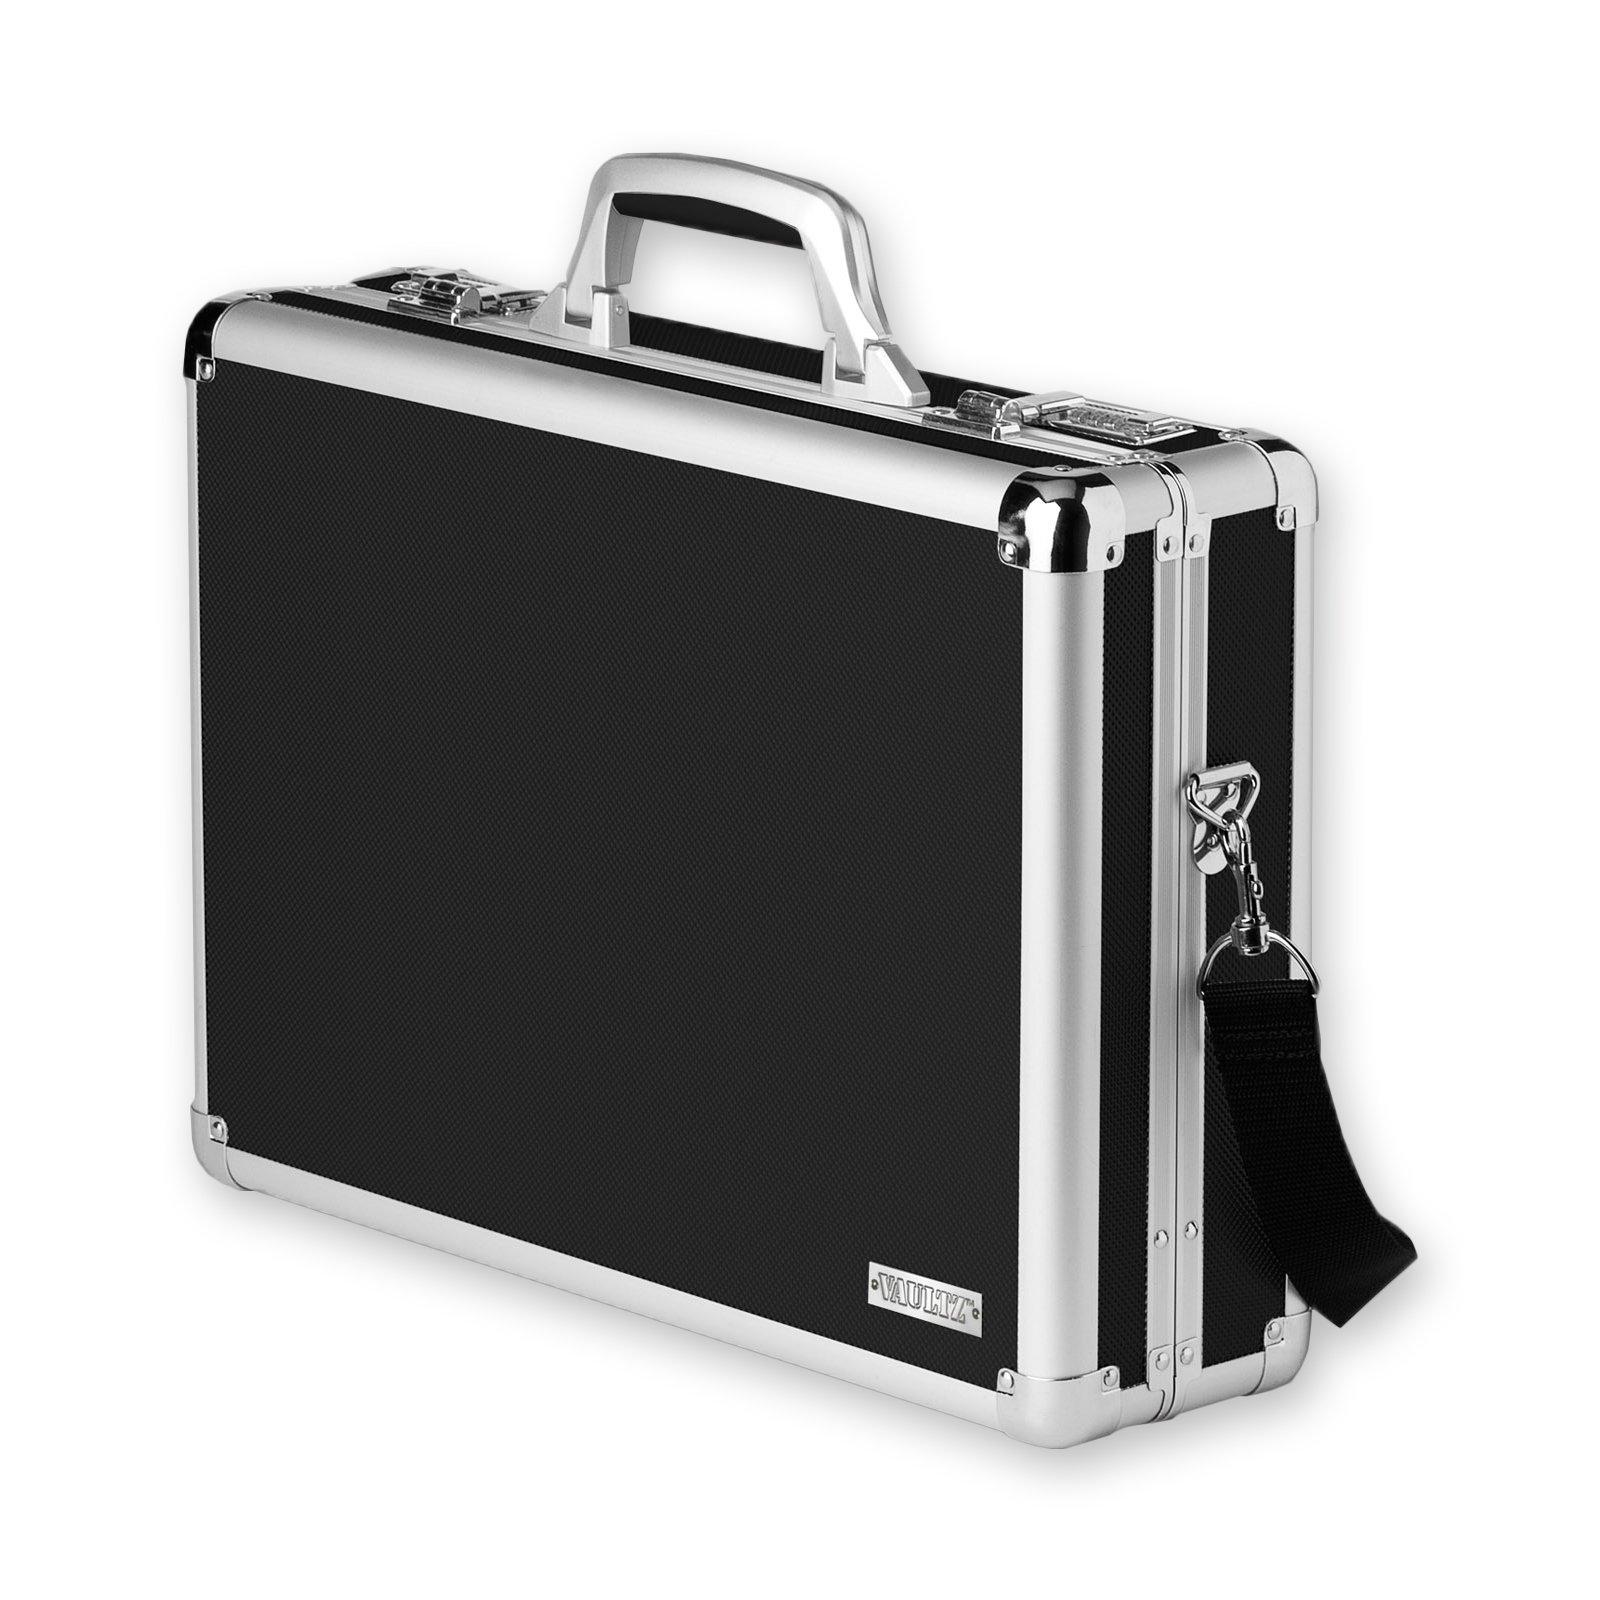 Vaultz Locking Laptop Case, Black (VZ01216) by Vaultz (Image #2)